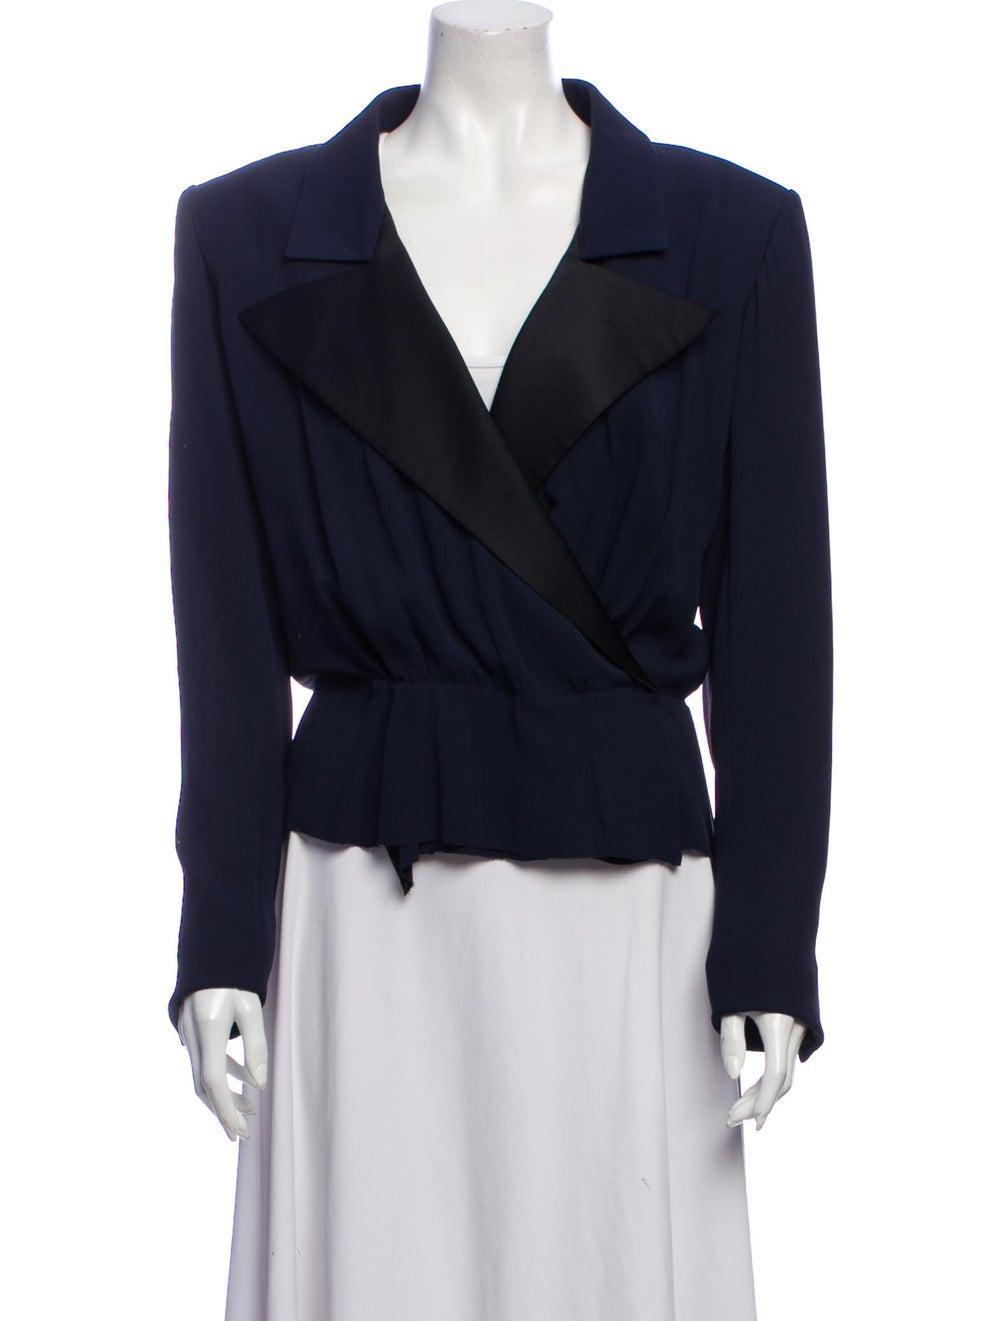 Yves Saint Laurent Vintage 1970's Evening Jacket … - image 4